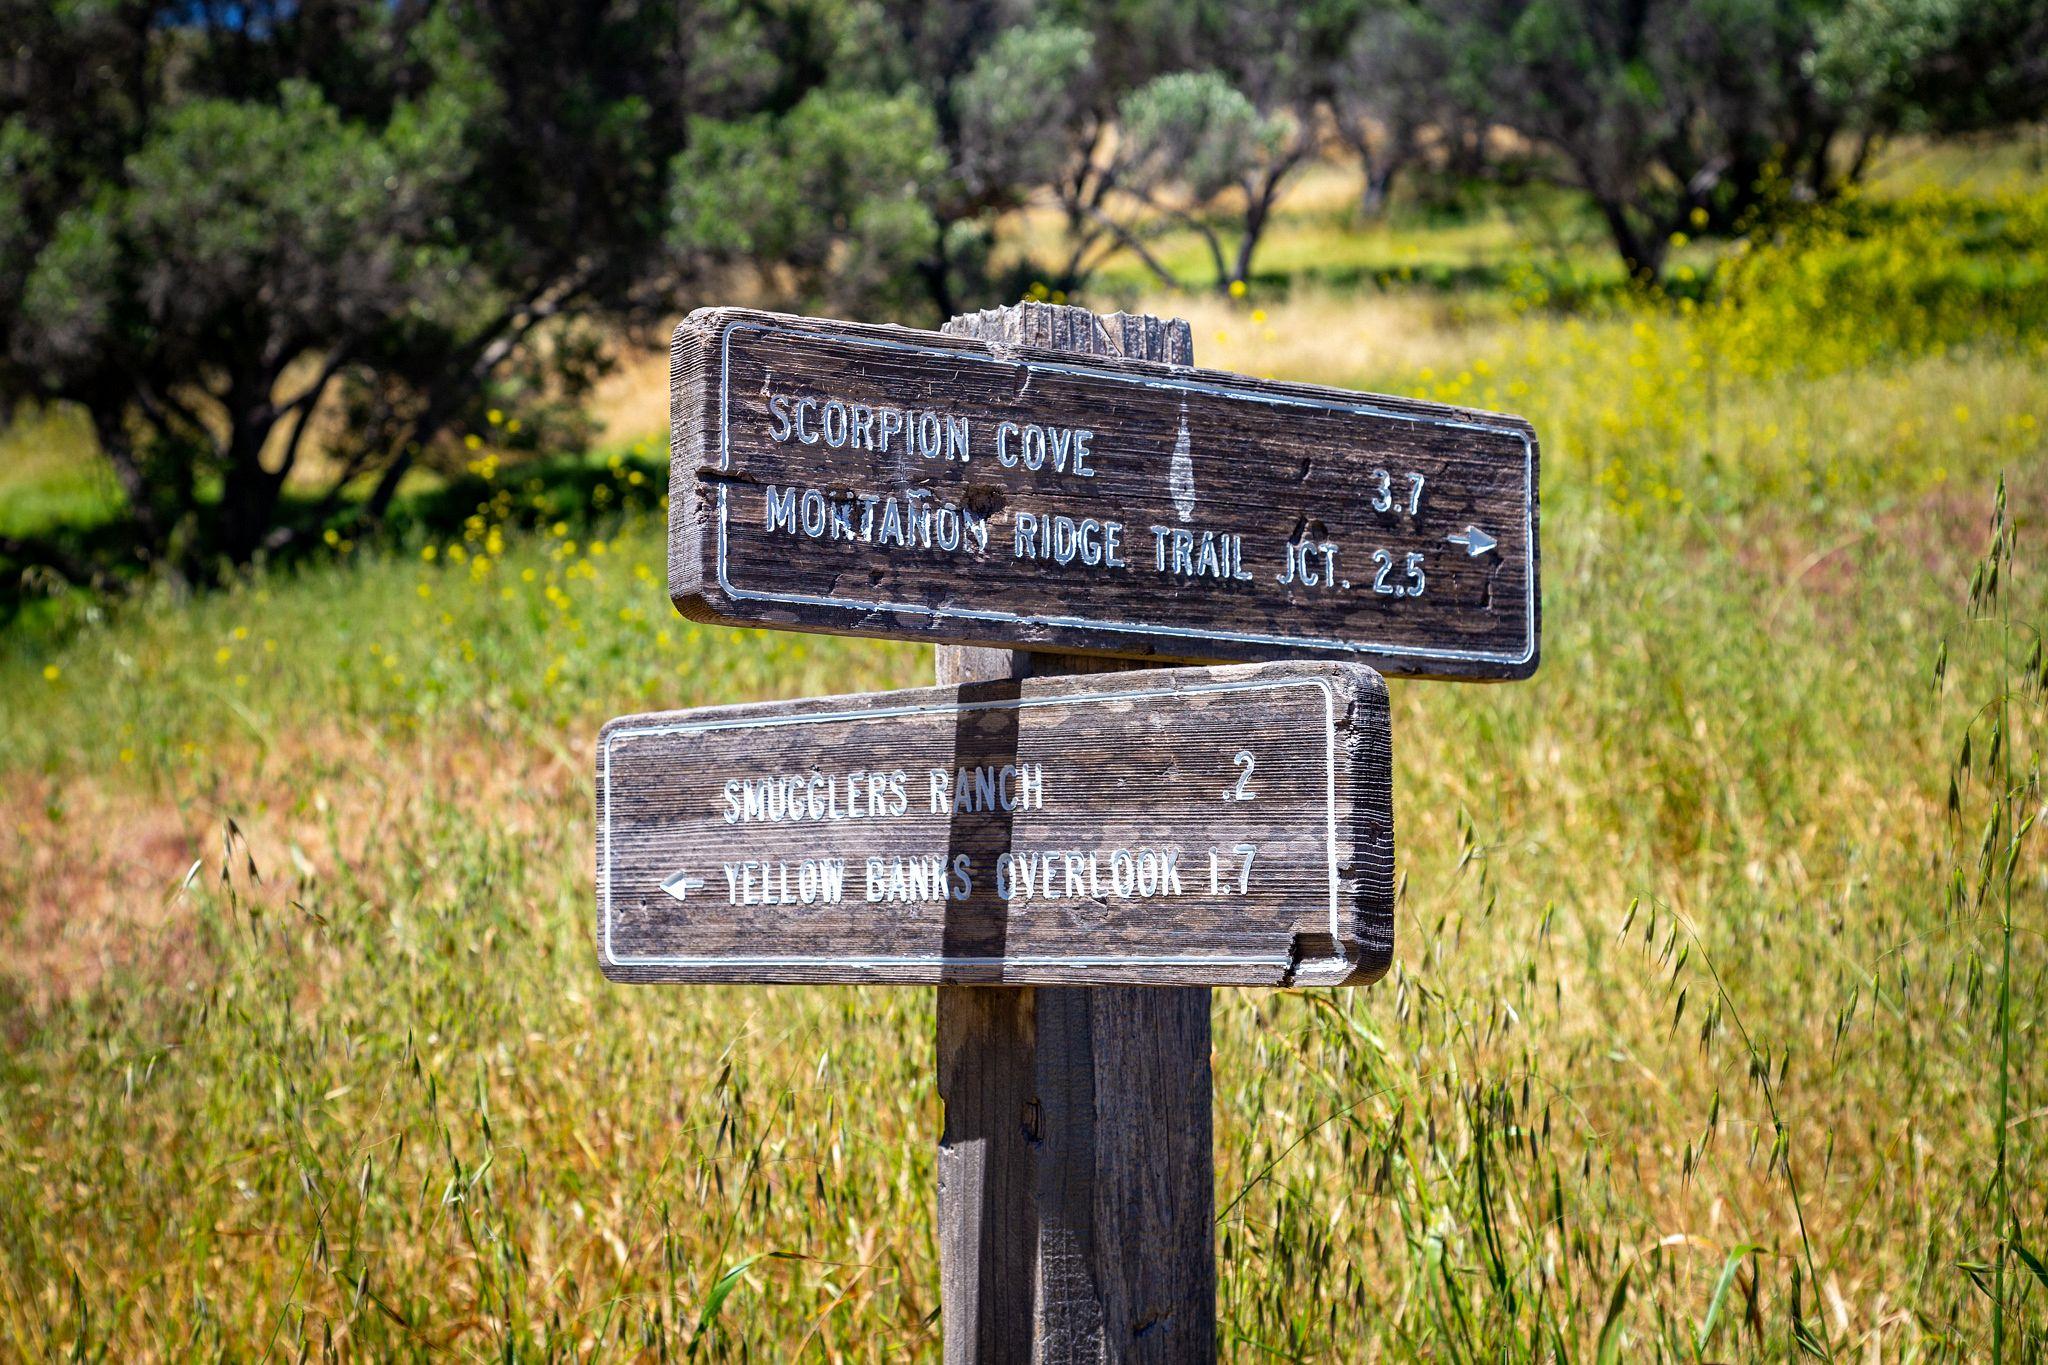 Smugglers Cove Loop Trail